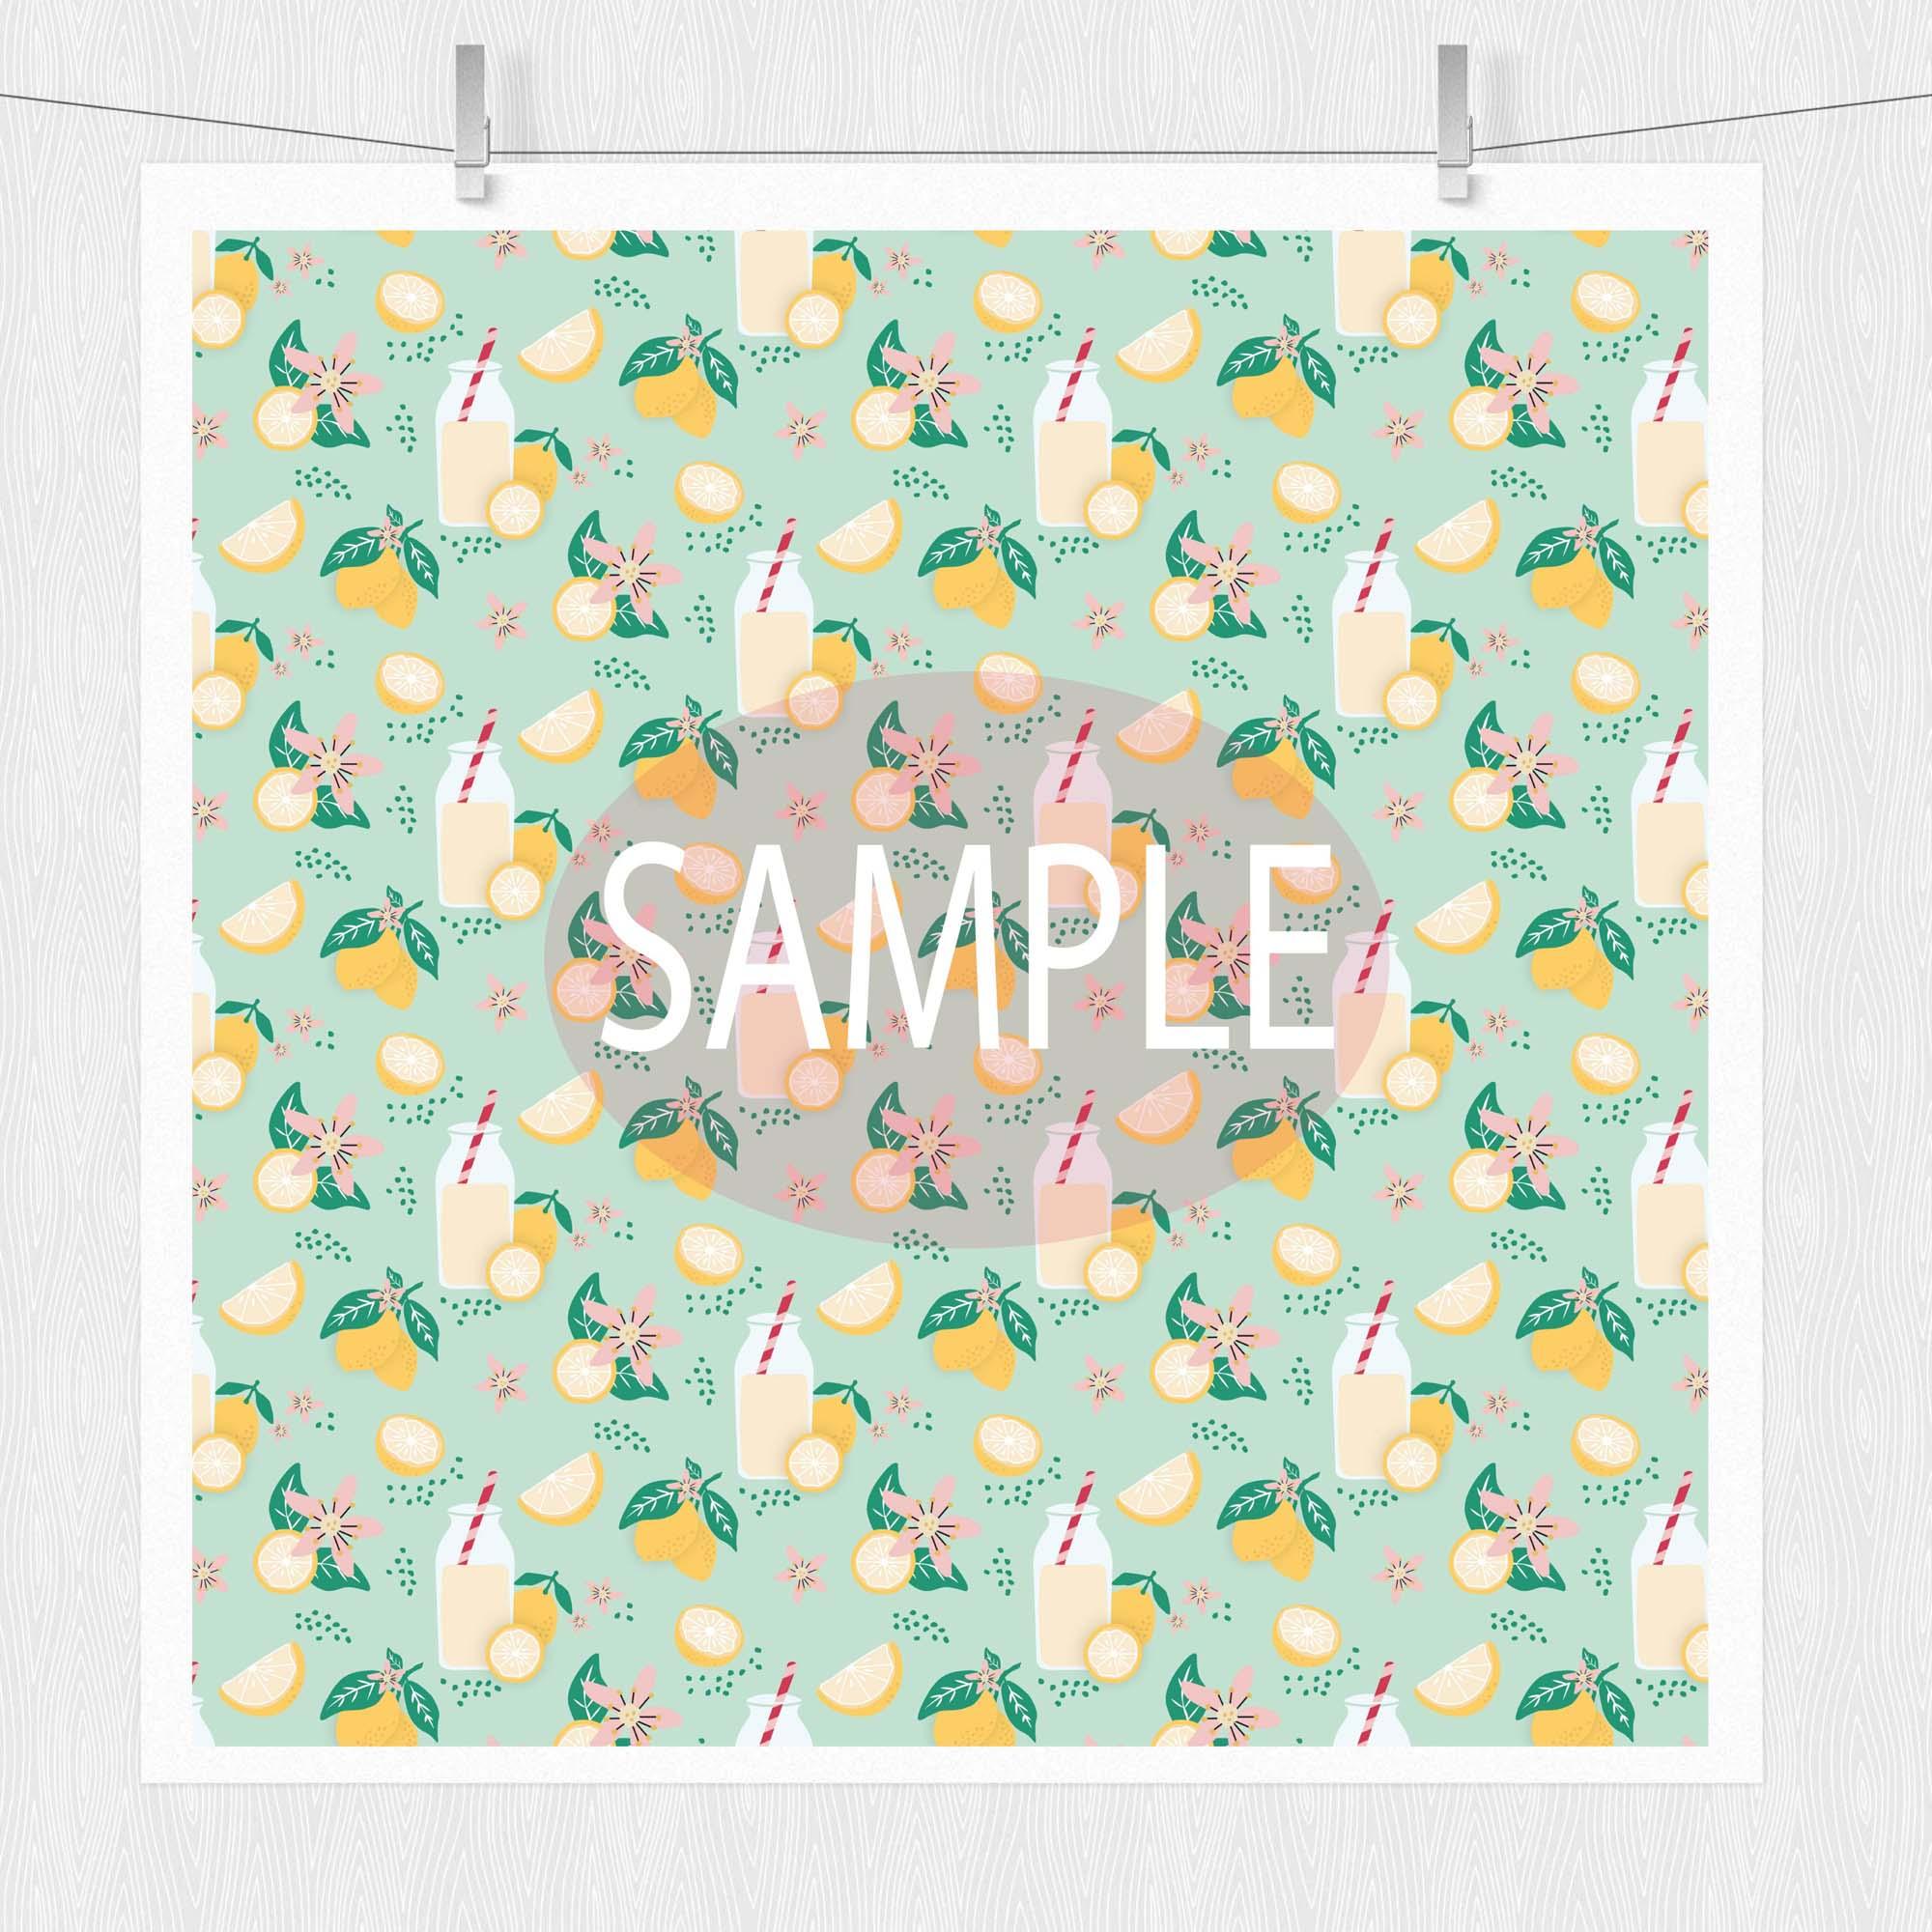 Spring Digital Paper Pack - Spring Showers example image 2